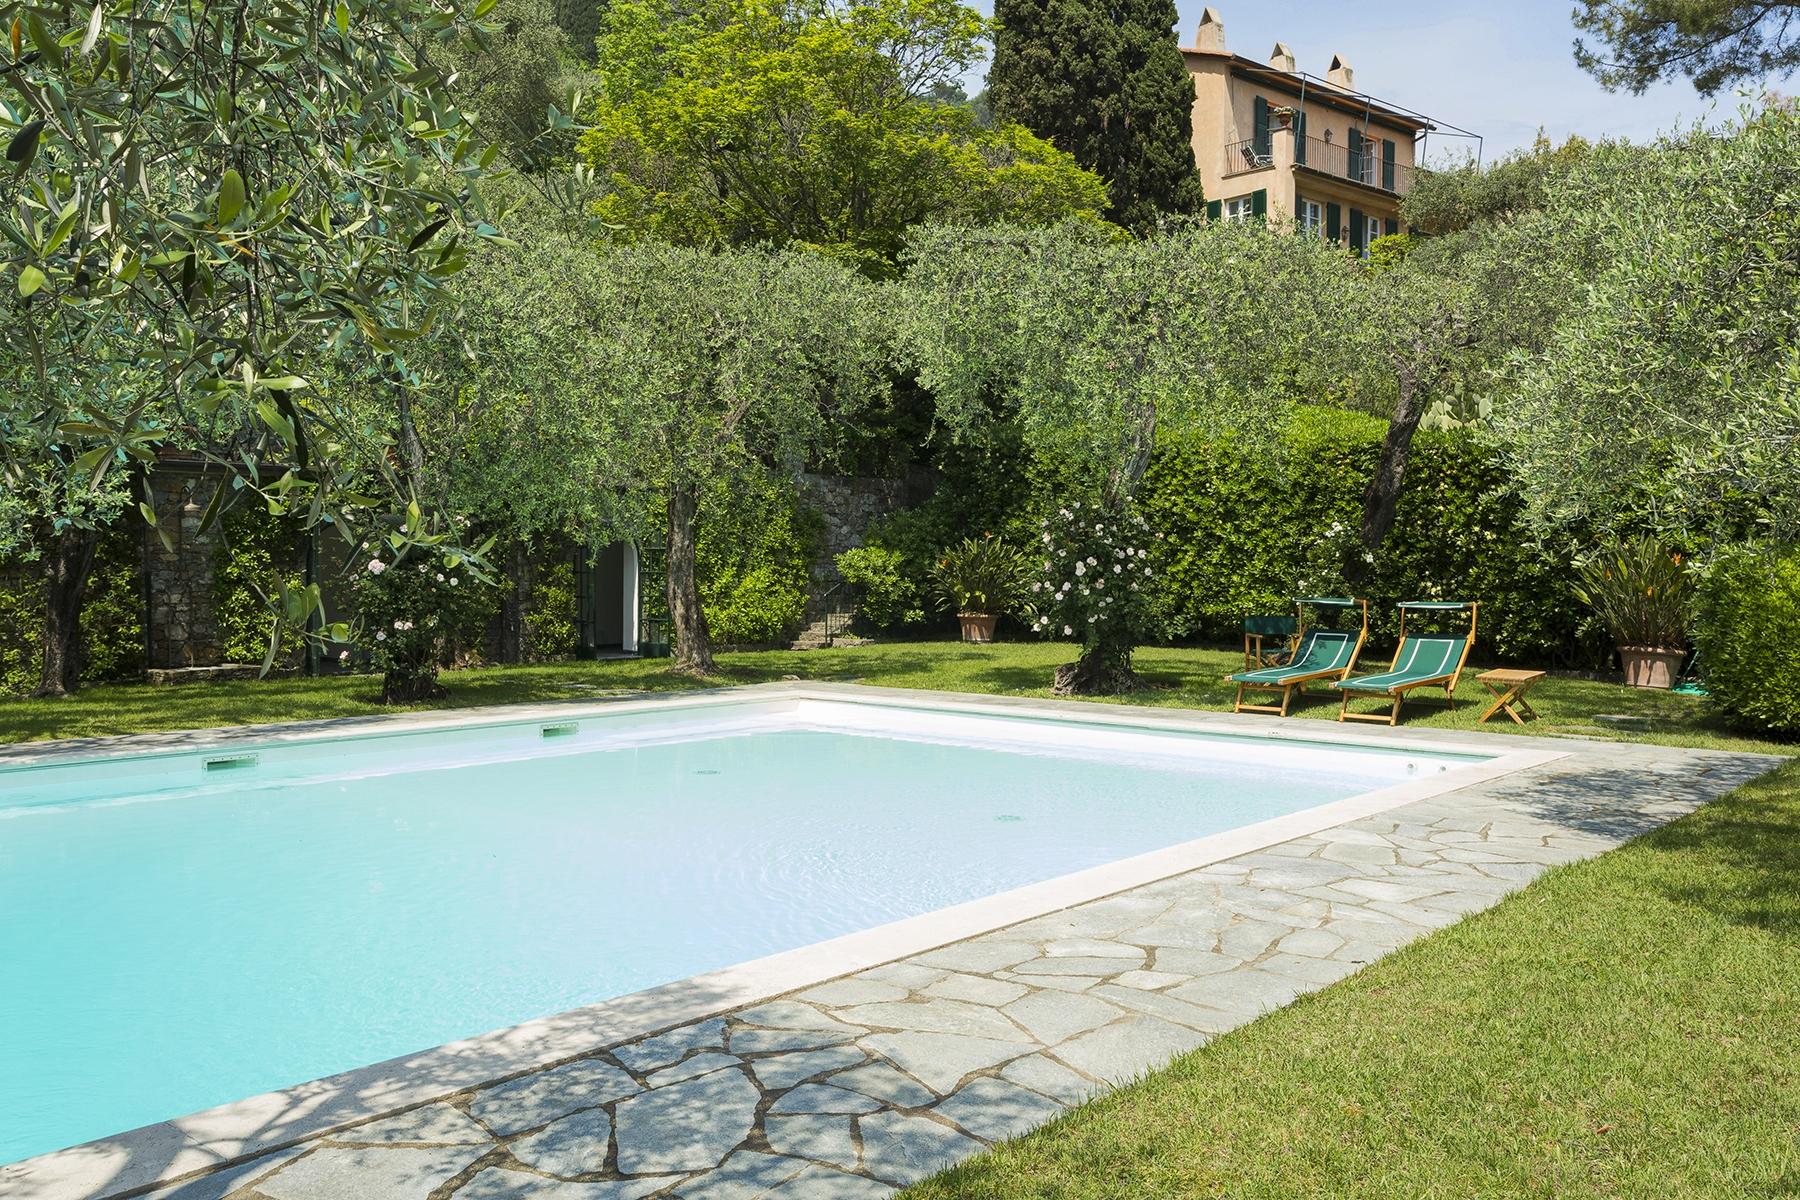 Villa in Vendita a Santa Margherita Ligure: 5 locali, 580 mq - Foto 9